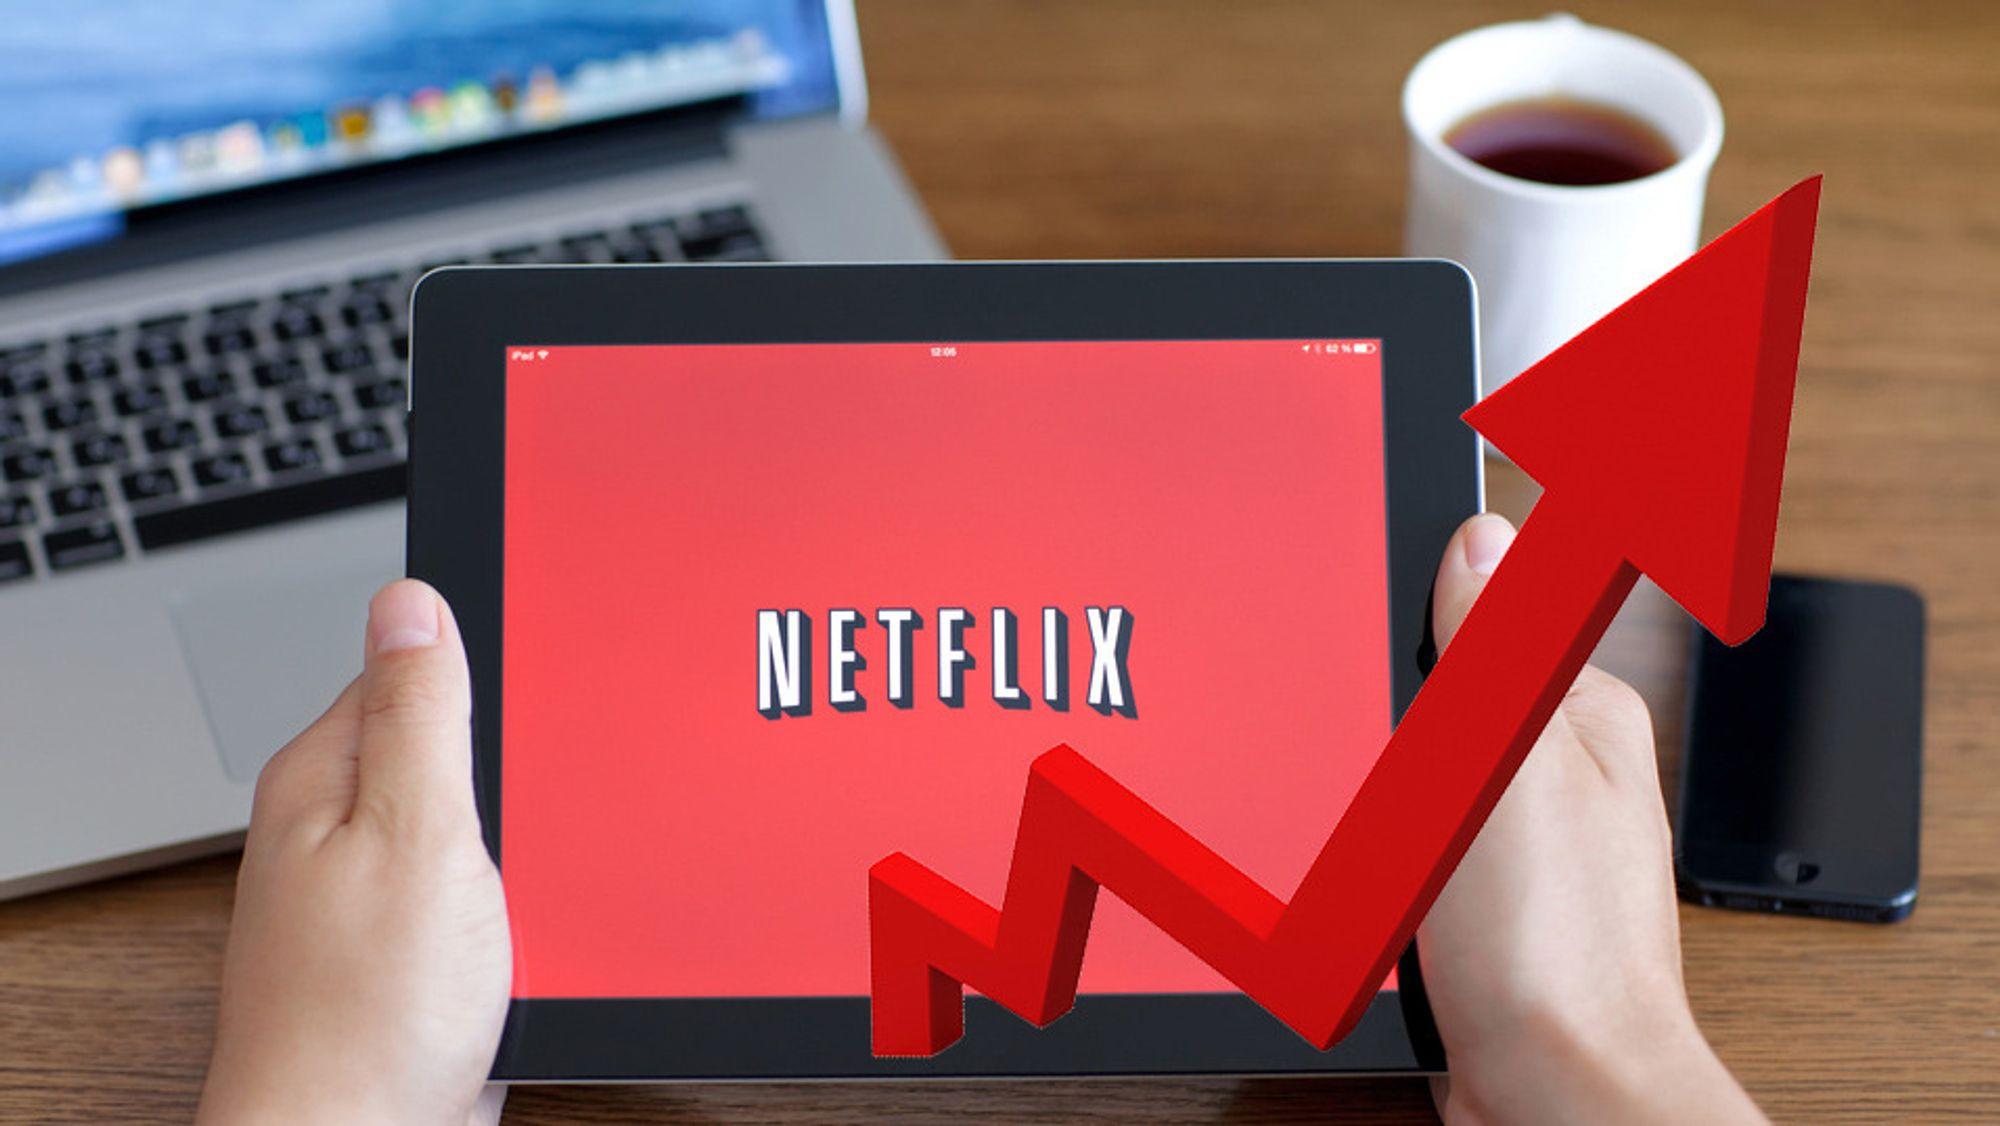 Netflix kaprer stadig flere abonnementer.